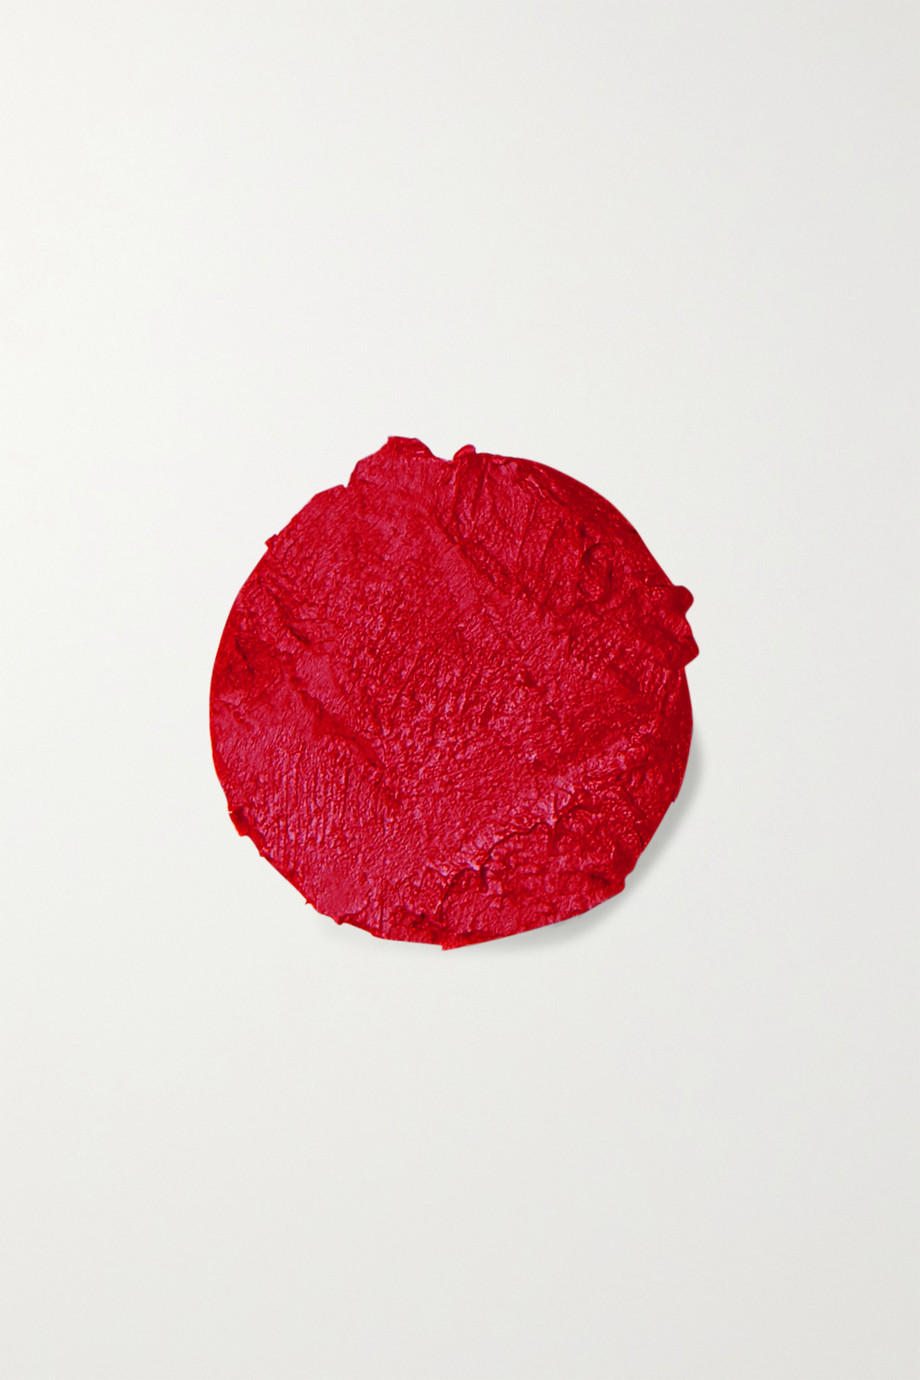 Kevyn Aucoin Unforgettable Lipstick - Fatal